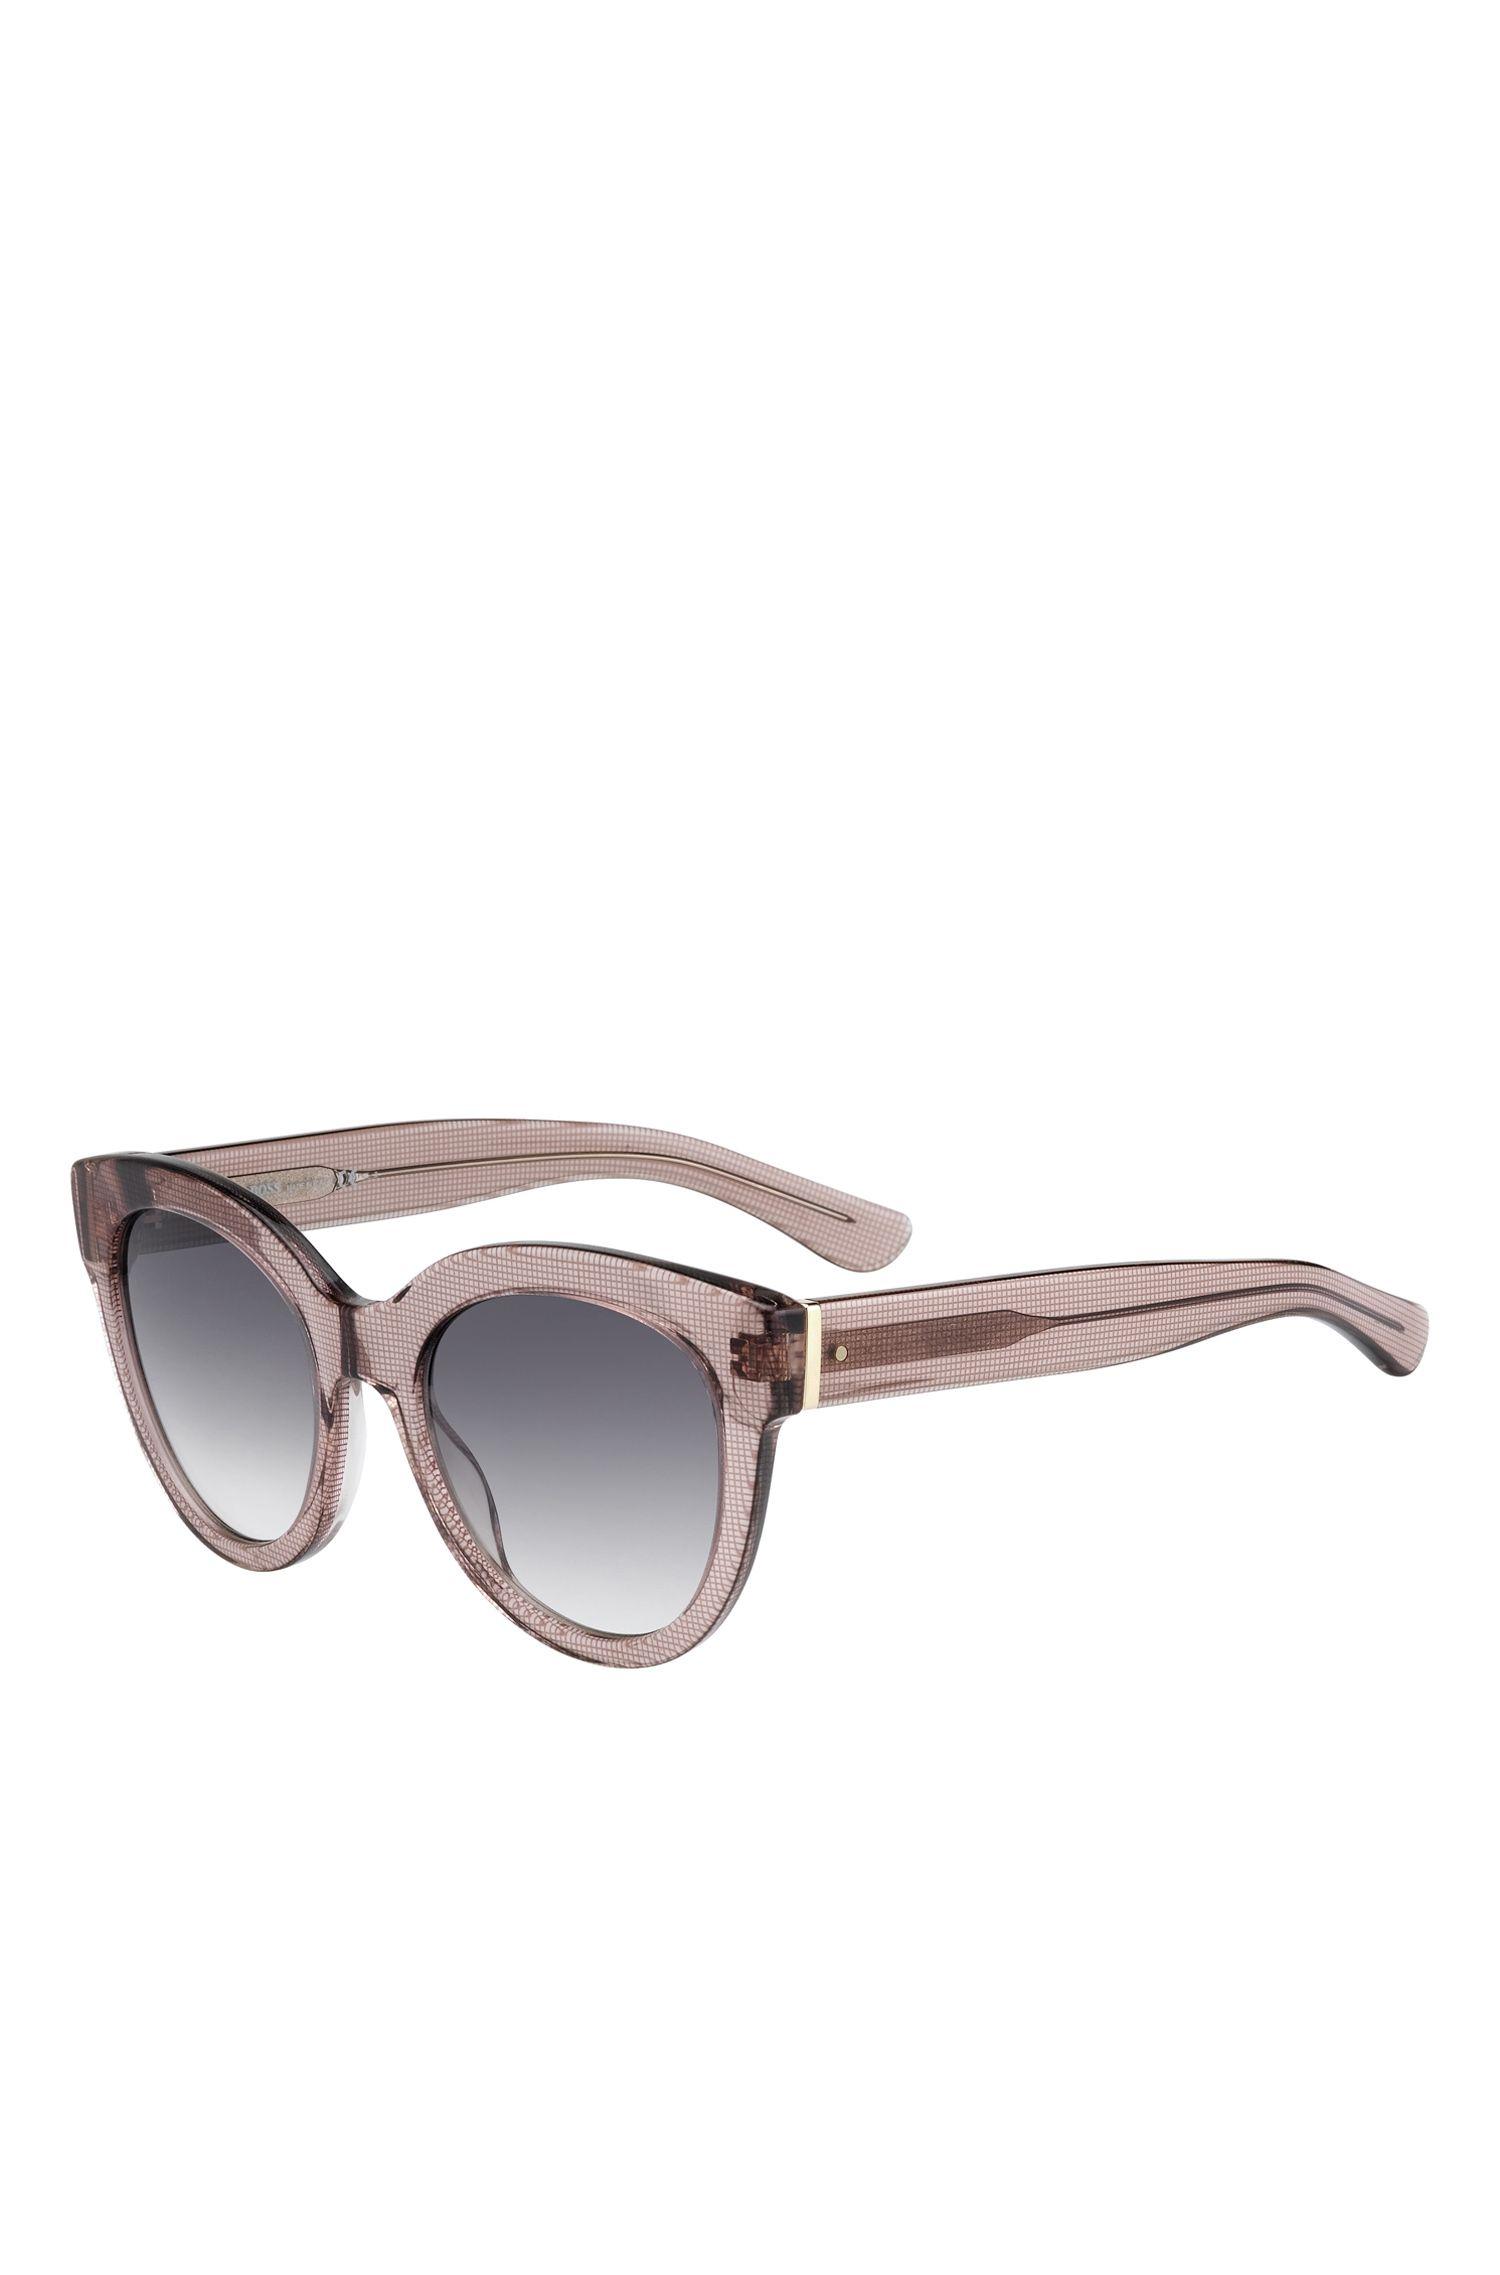 'BOSS 0675' | Gray Gradient Lens Cateye Sunglasses